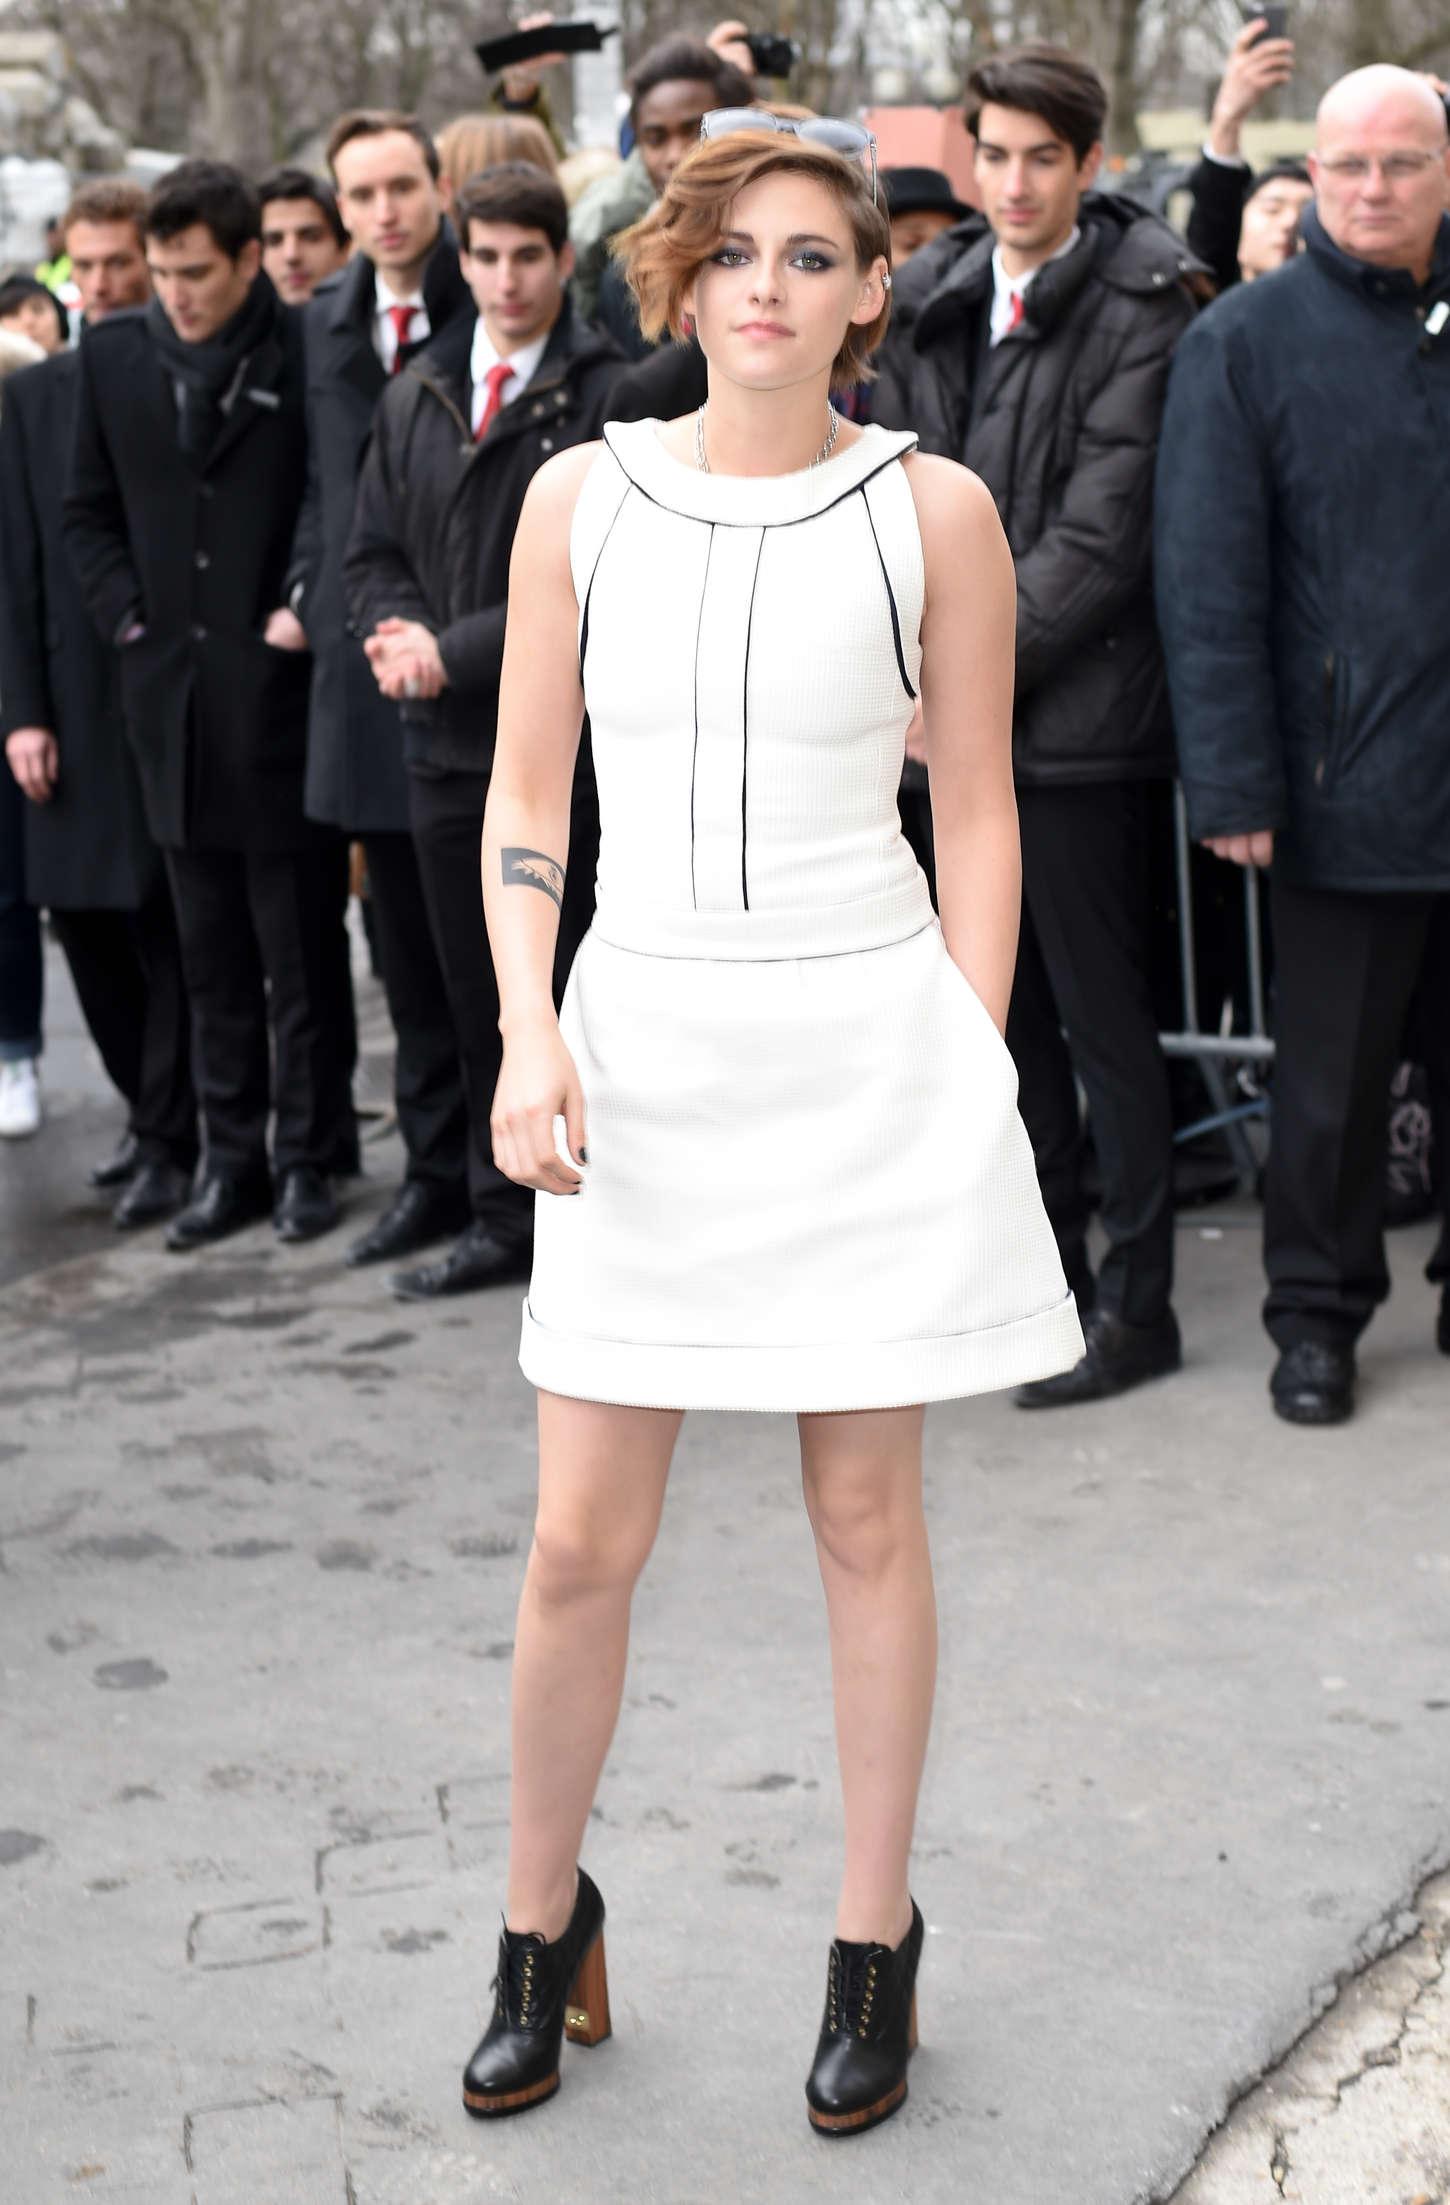 Kristen Stewart Chanel Fashion Show 2015 23 Gotceleb